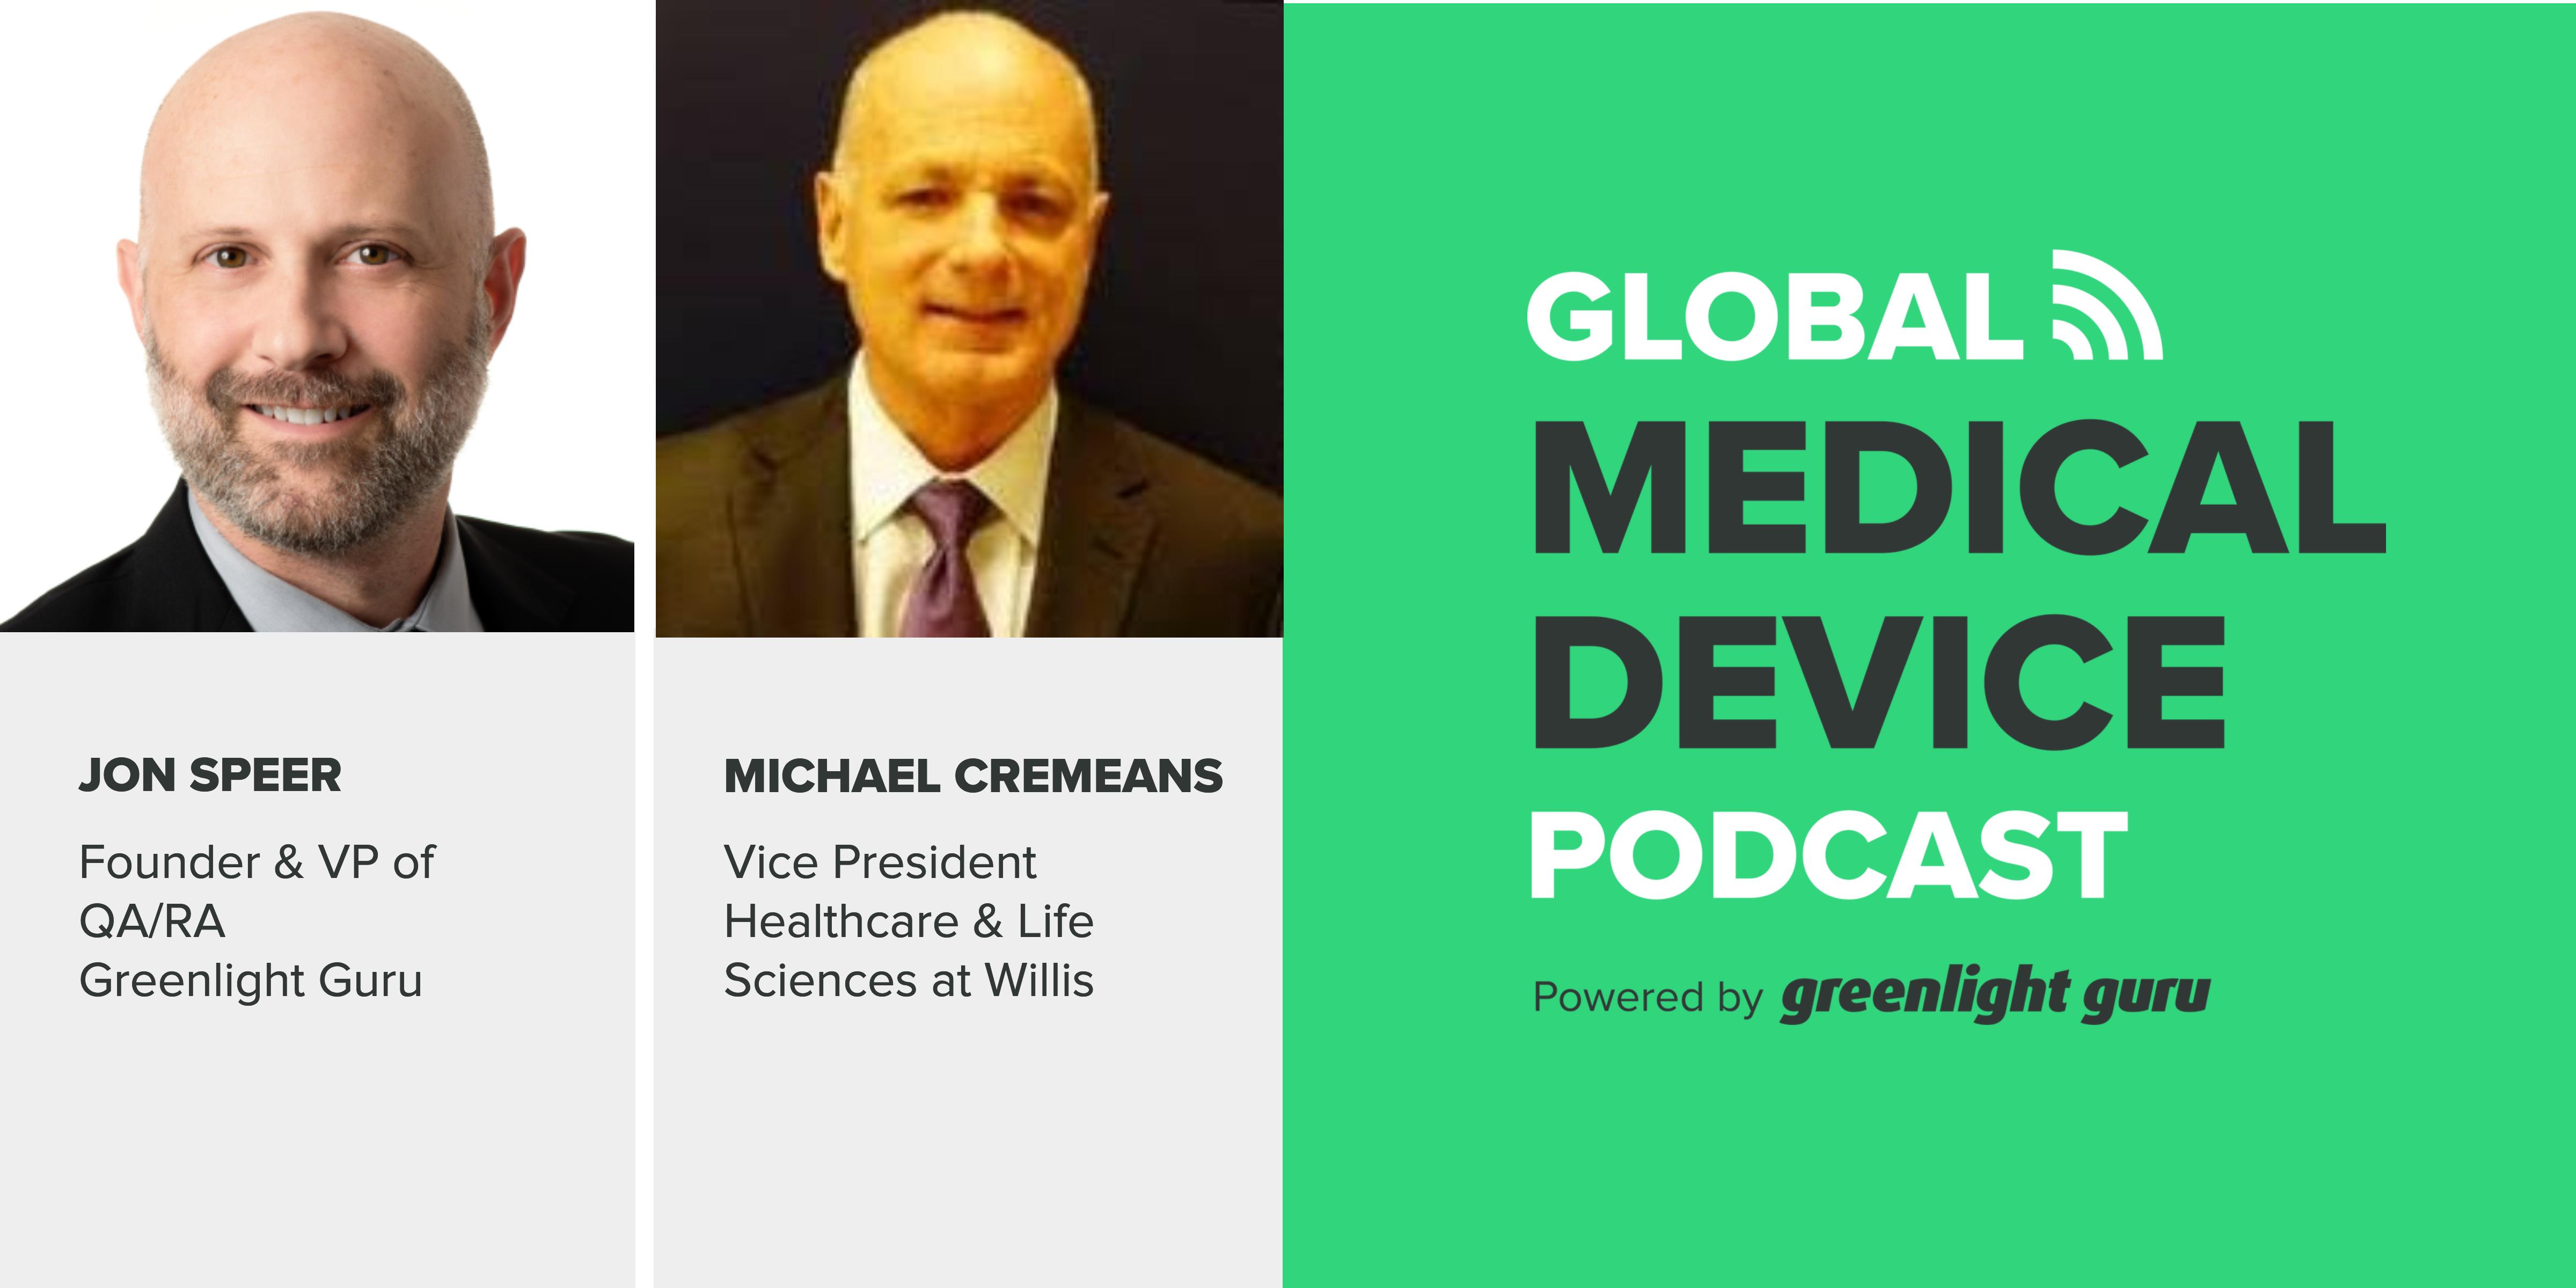 podcast_michael cremeans